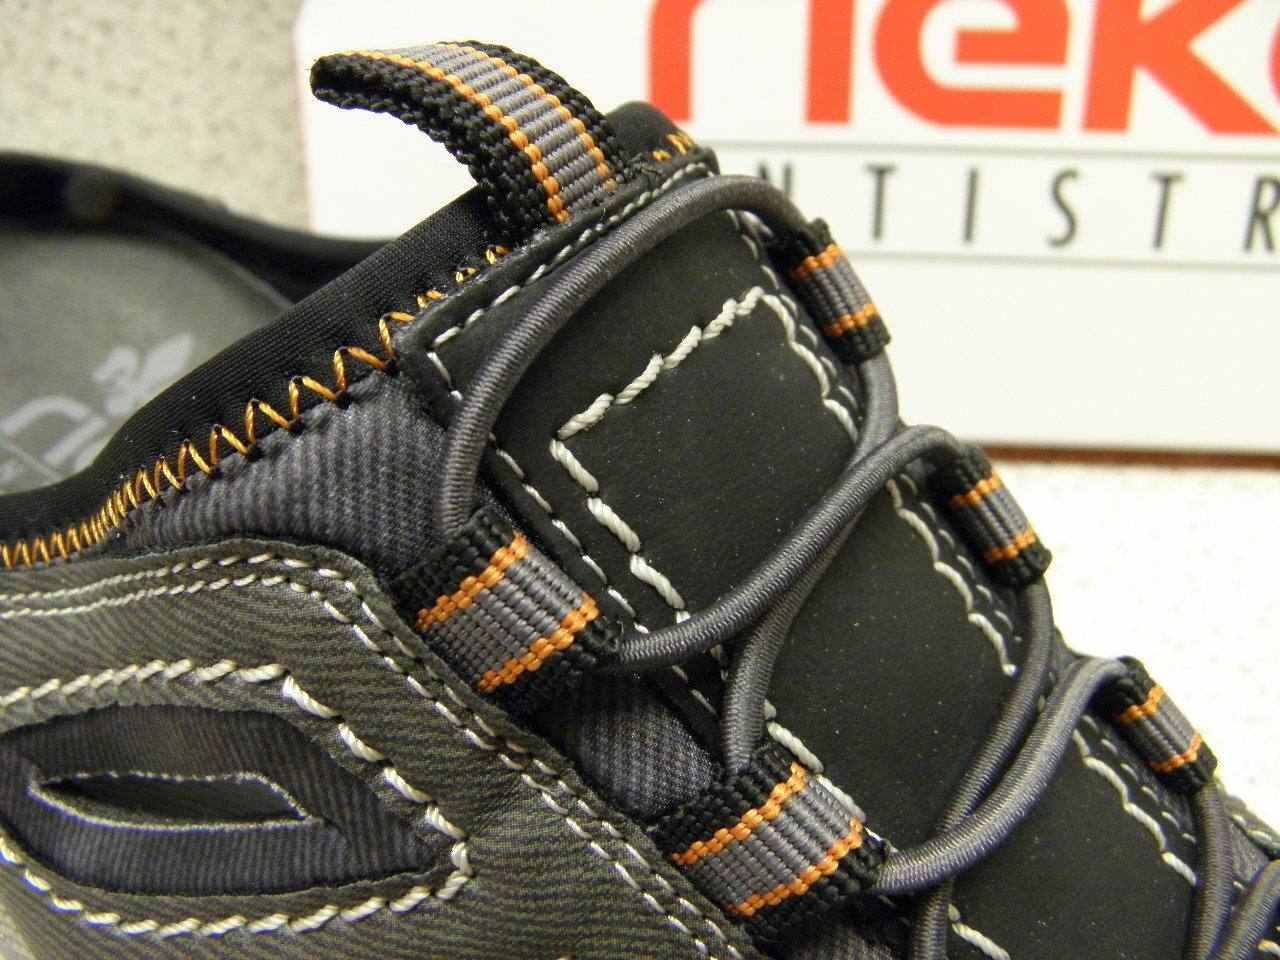 rieker ® SALE reduziert  Clog Pantolette grau + gratis Premium - Socken (R433)